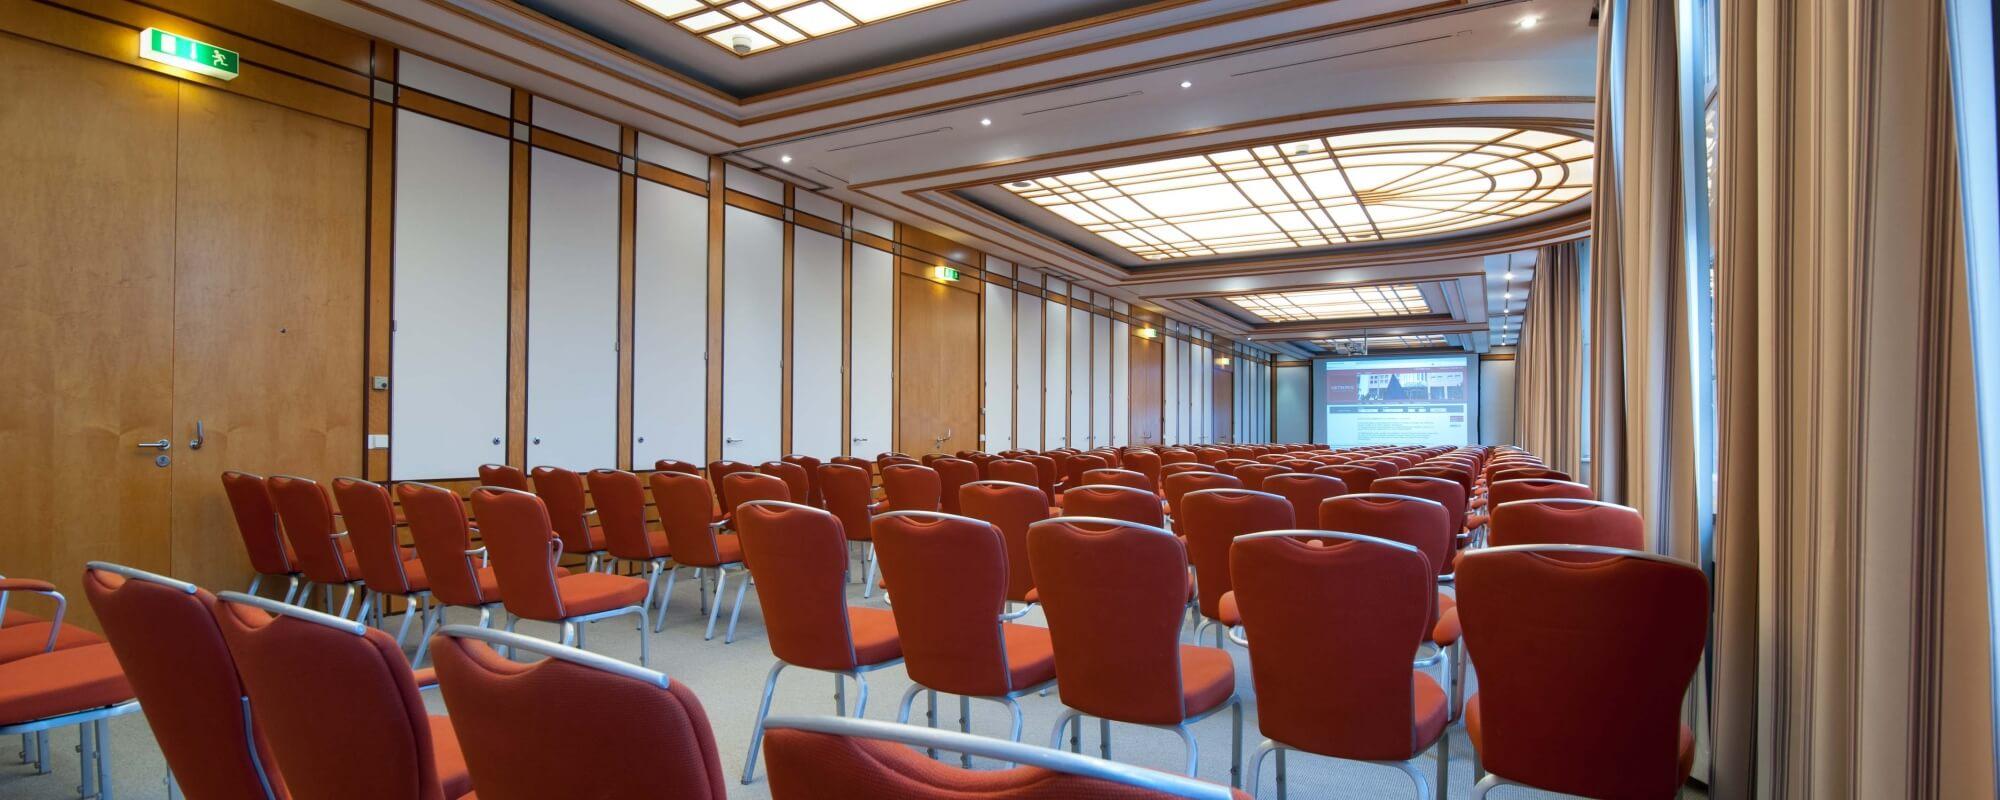 Seminars & Conventions